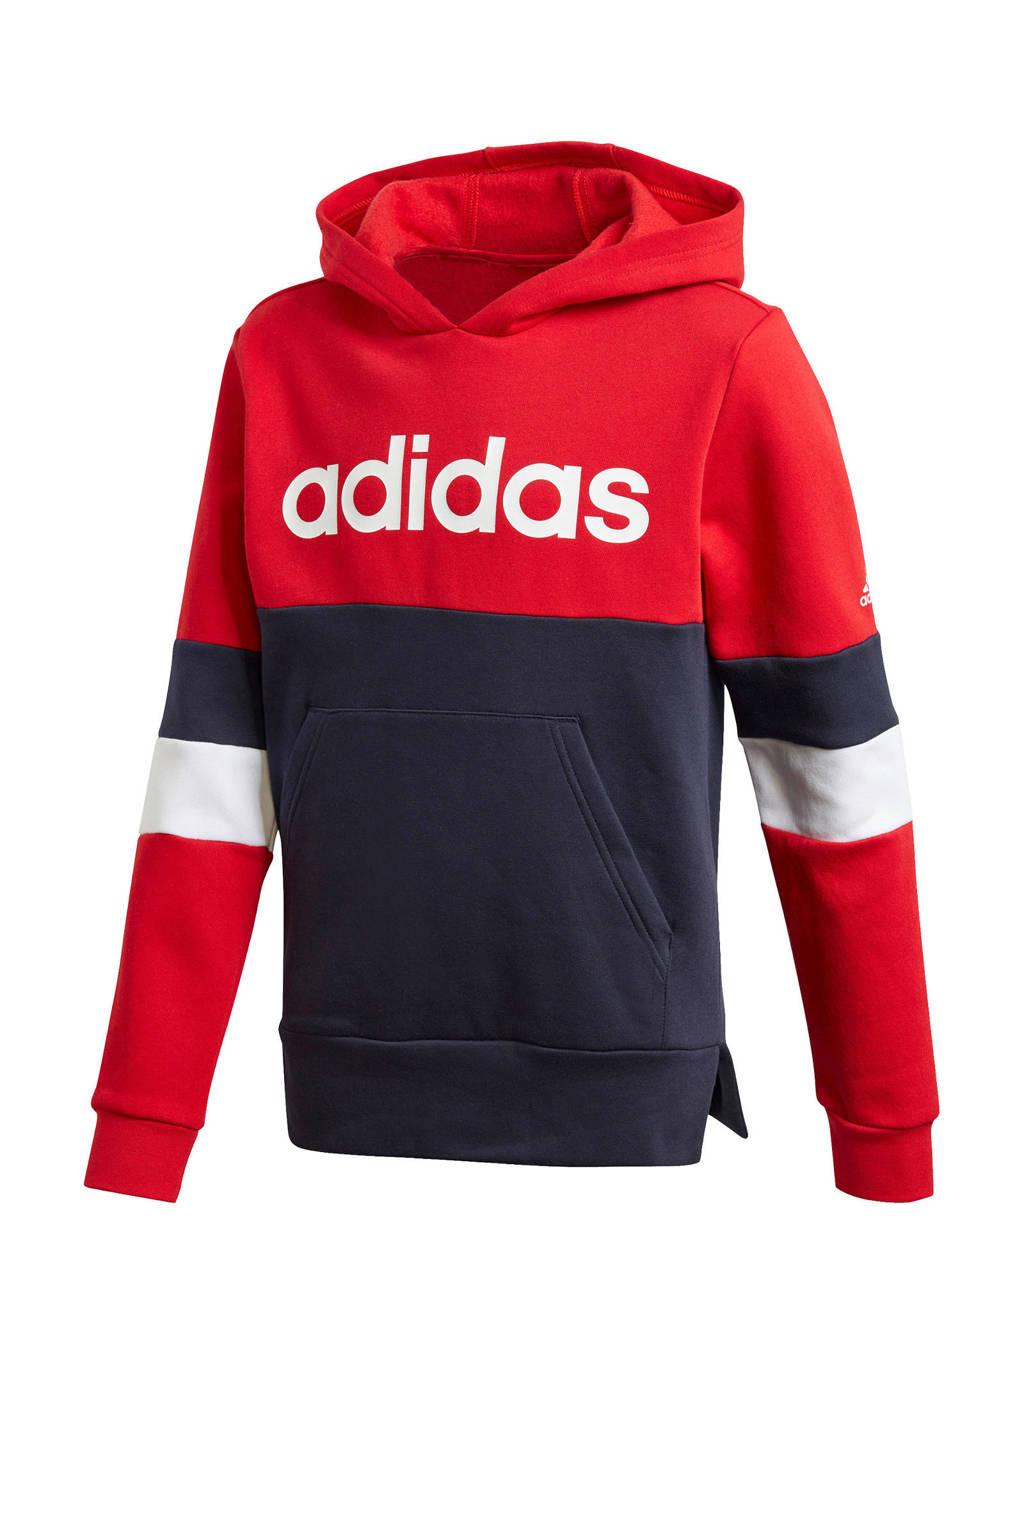 adidas Performance   sportsweater donkerblauw/rood, Donkerblauw/rood